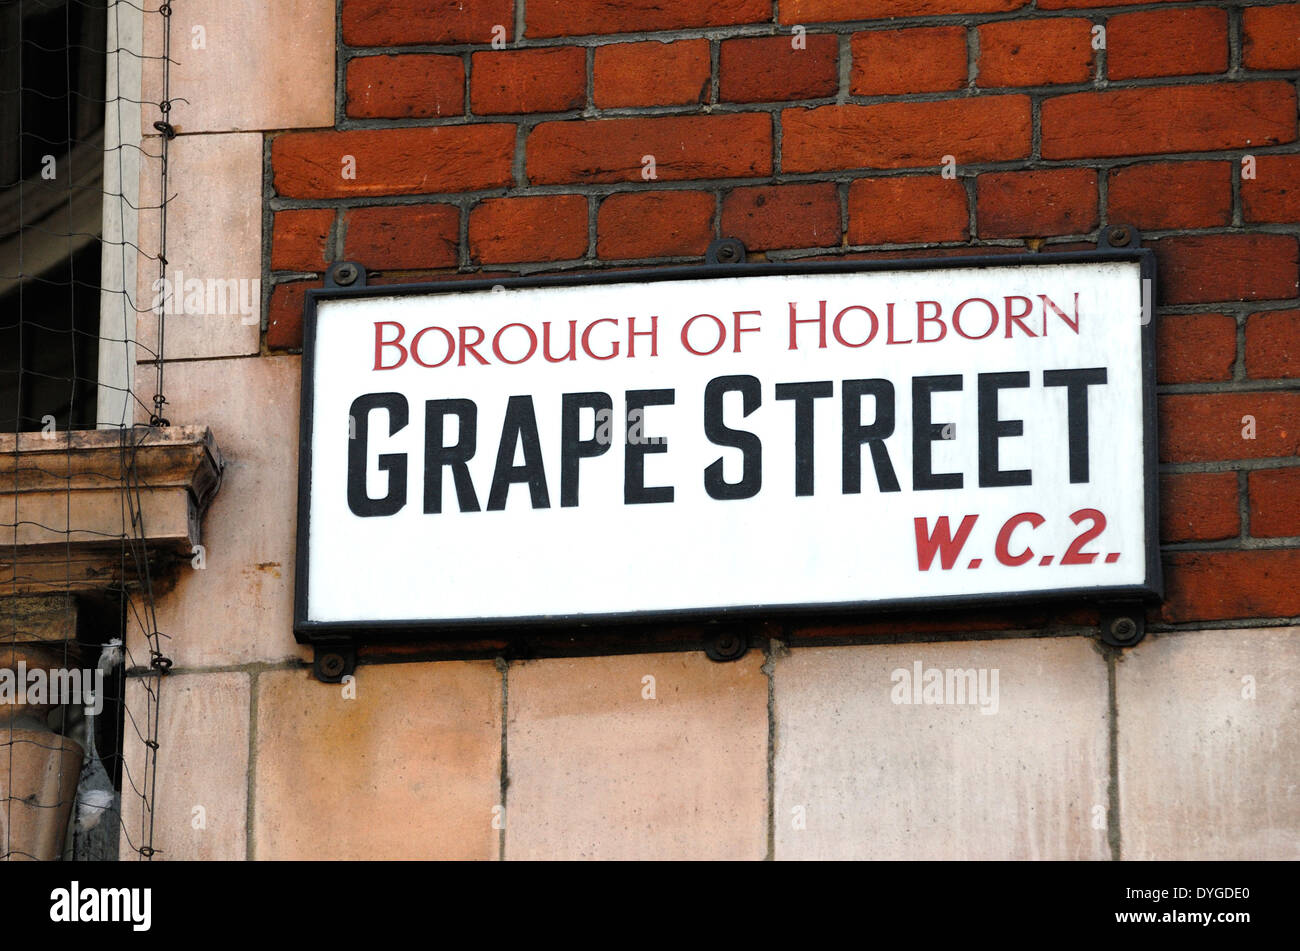 London, England, UK. Grape Street in Holborn - Stock Image